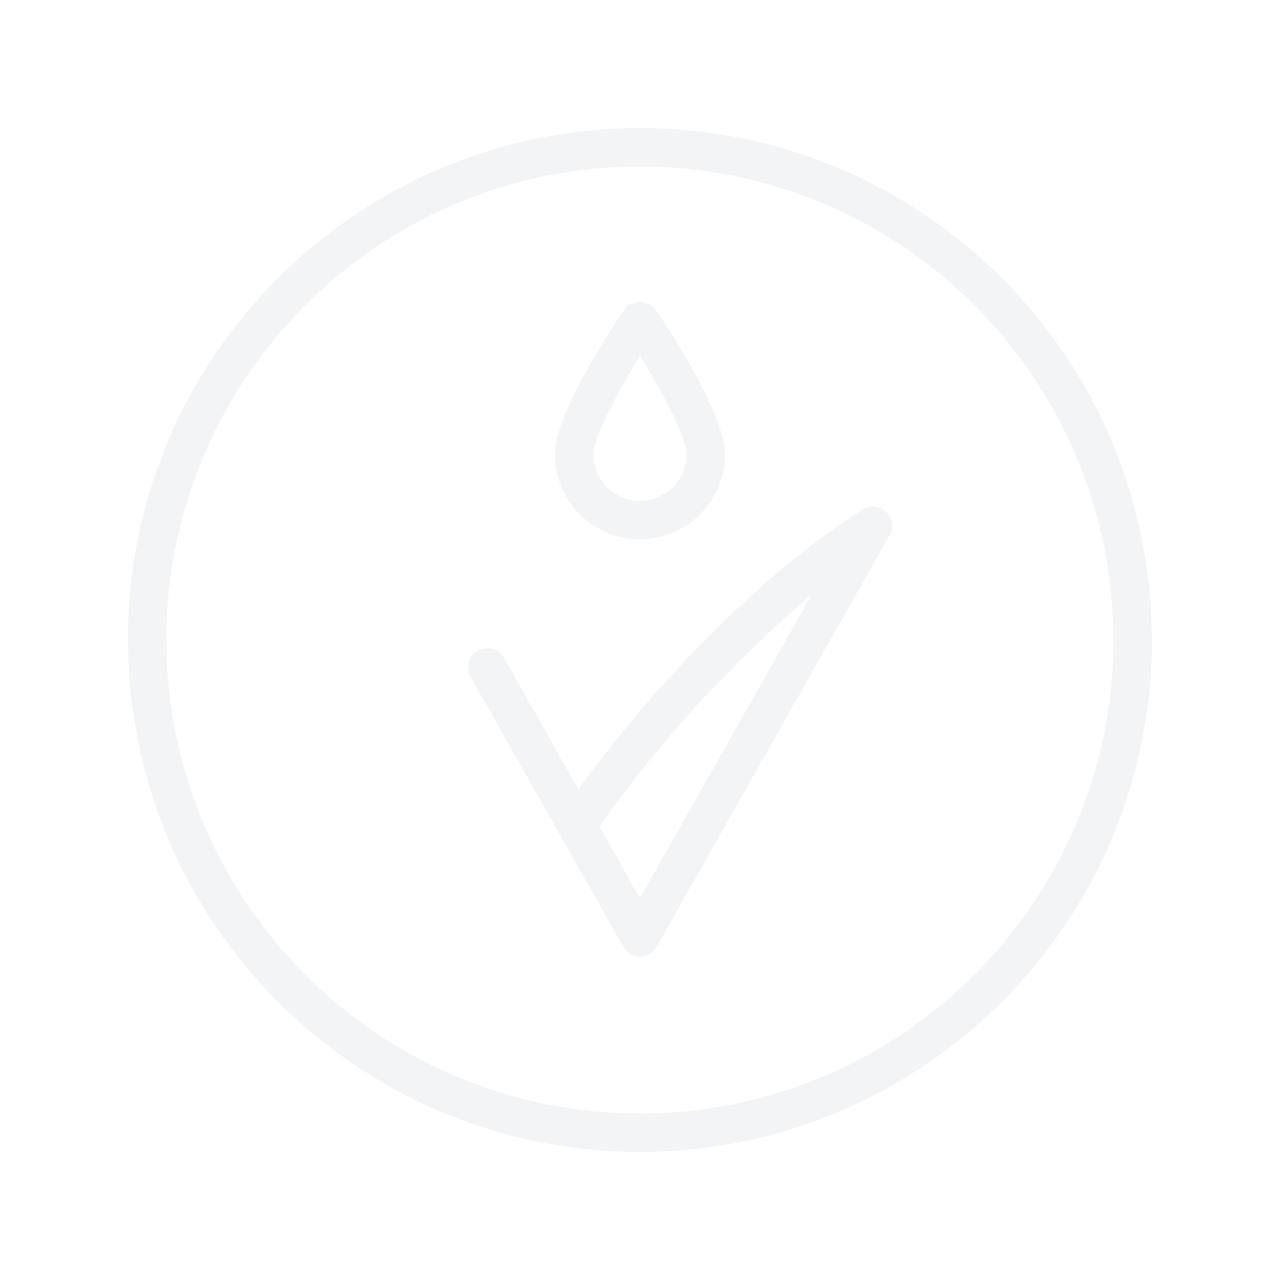 DR IRENA ERIS Telomeric Concentrated Under Eye Cream SPF20 15ml